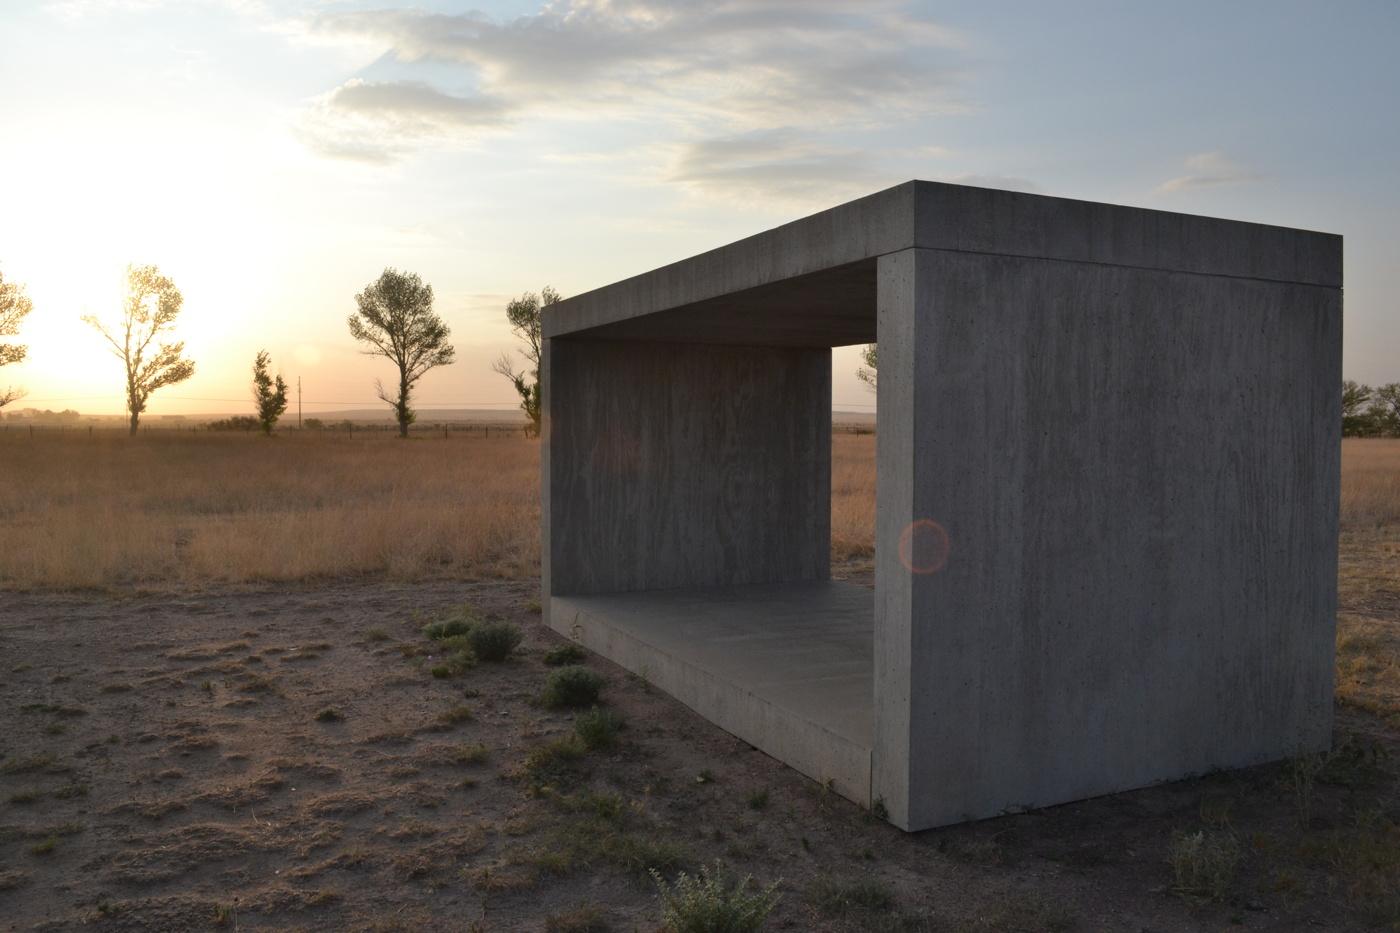 judd_chinati_concrete_wiki.jpg